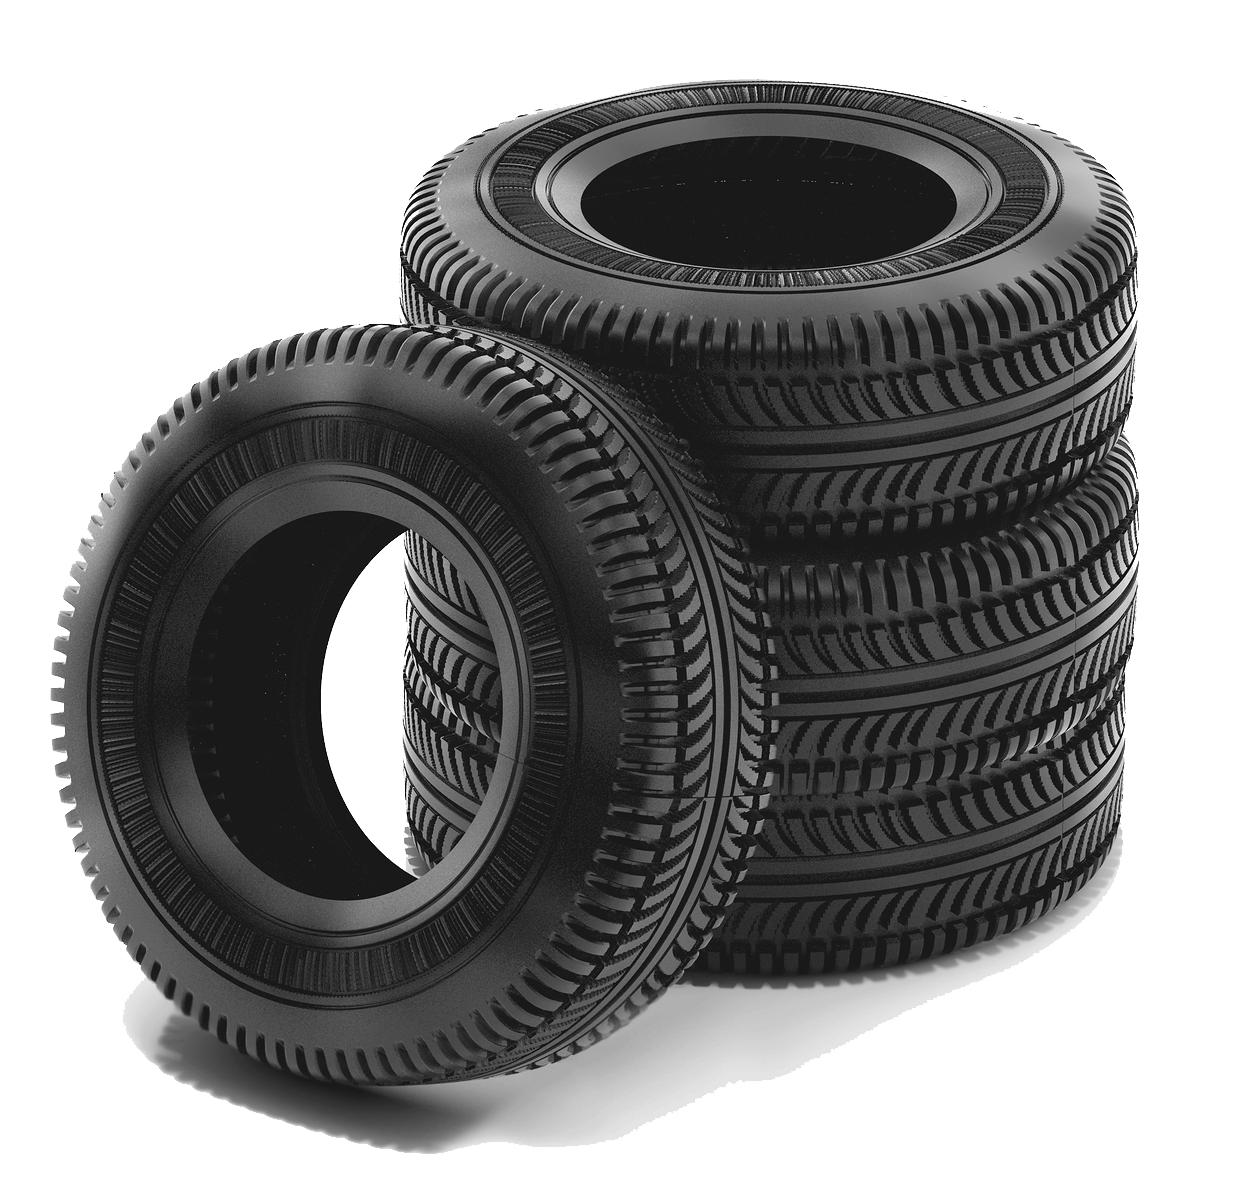 Car Tyre HD PNG - 89604